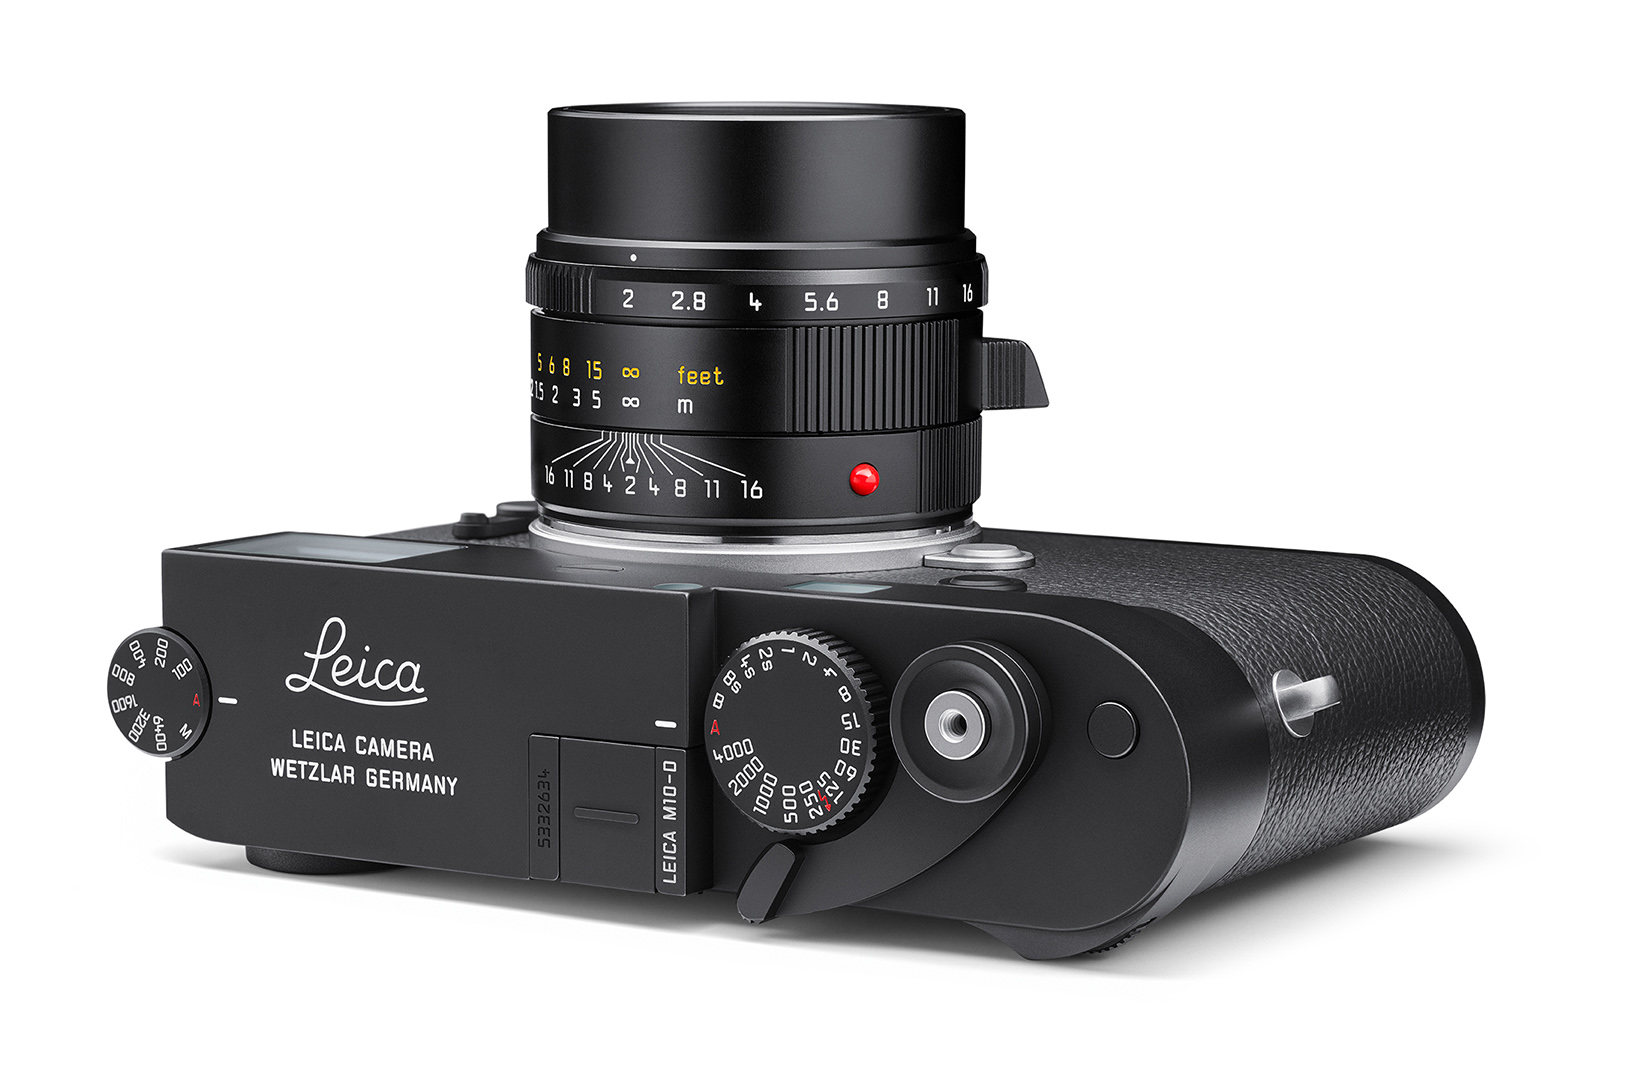 Leica_M10-D_Totale_liegend_weiss_LoRes_sRGB.jpg